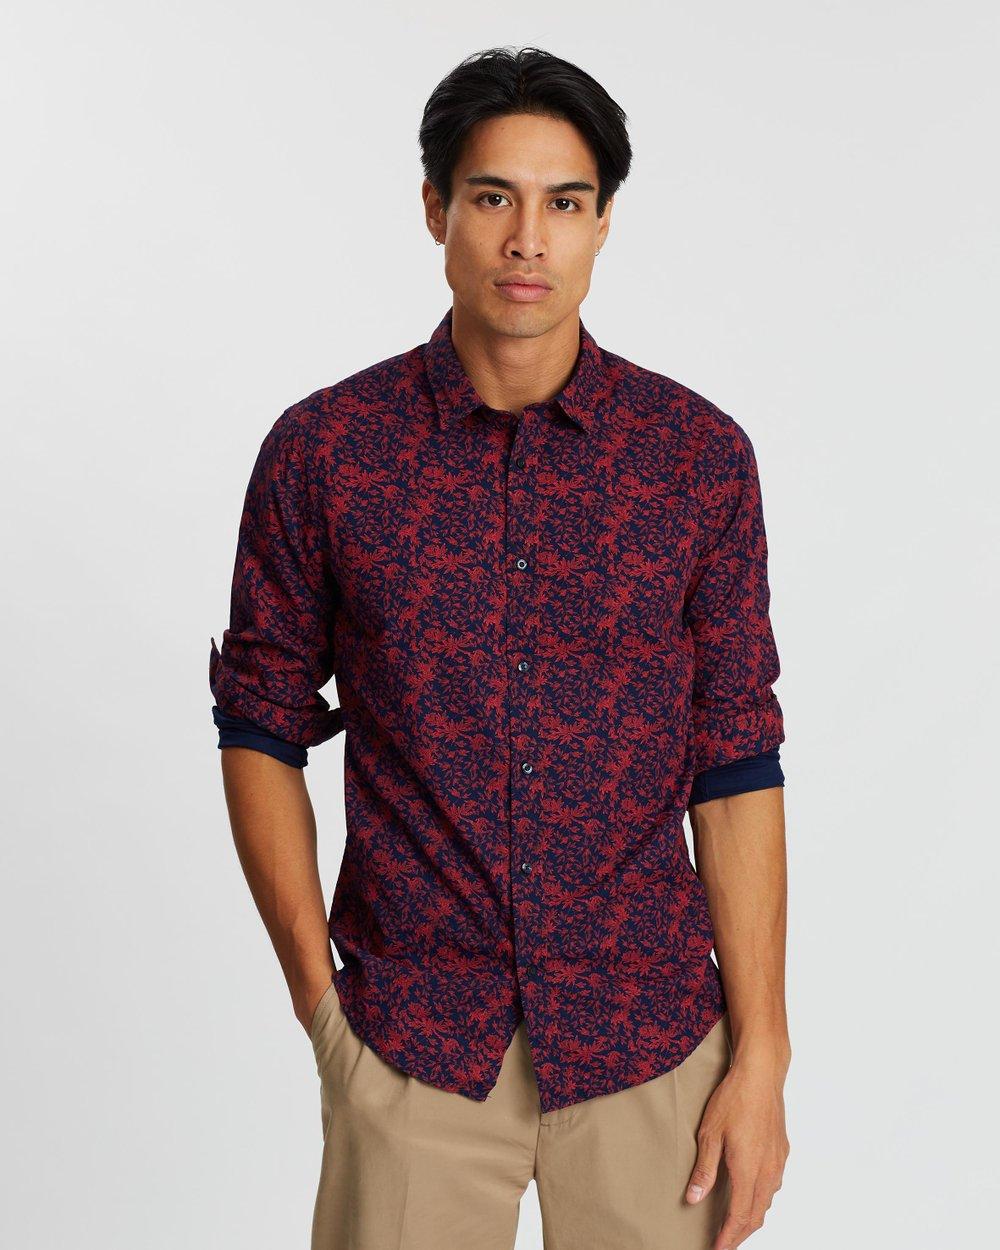 Scotch /& Soda Mens Regular Fit-Classic All-Over Printed Shirt Casual